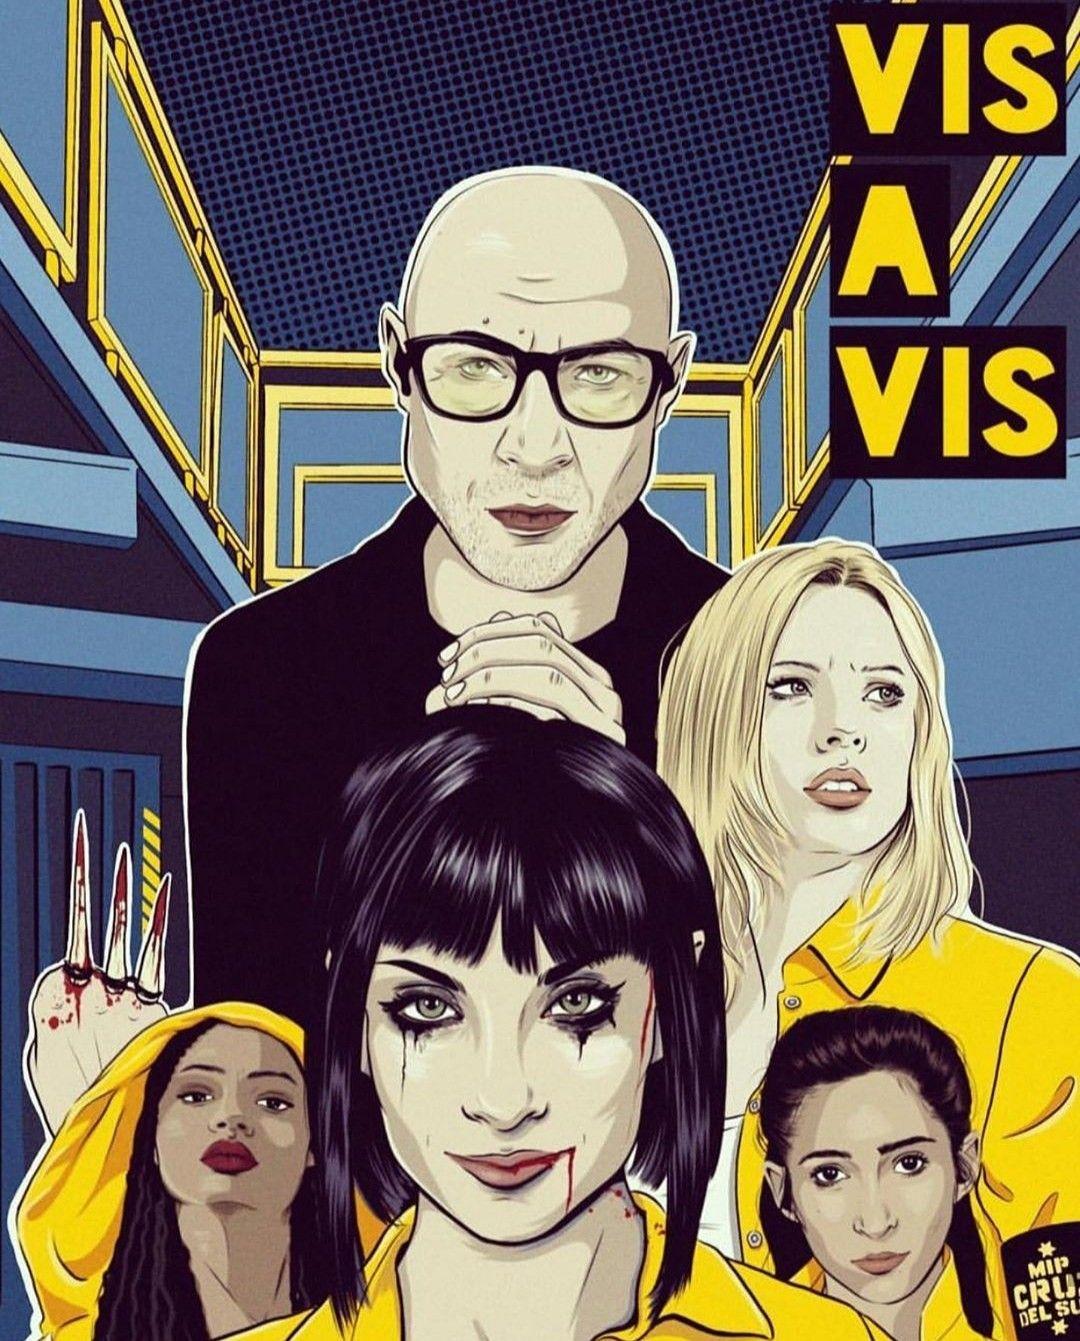 Vis Avis 4 Temporada Series De Netflix Fotos Lindos Dibujos Tumblr